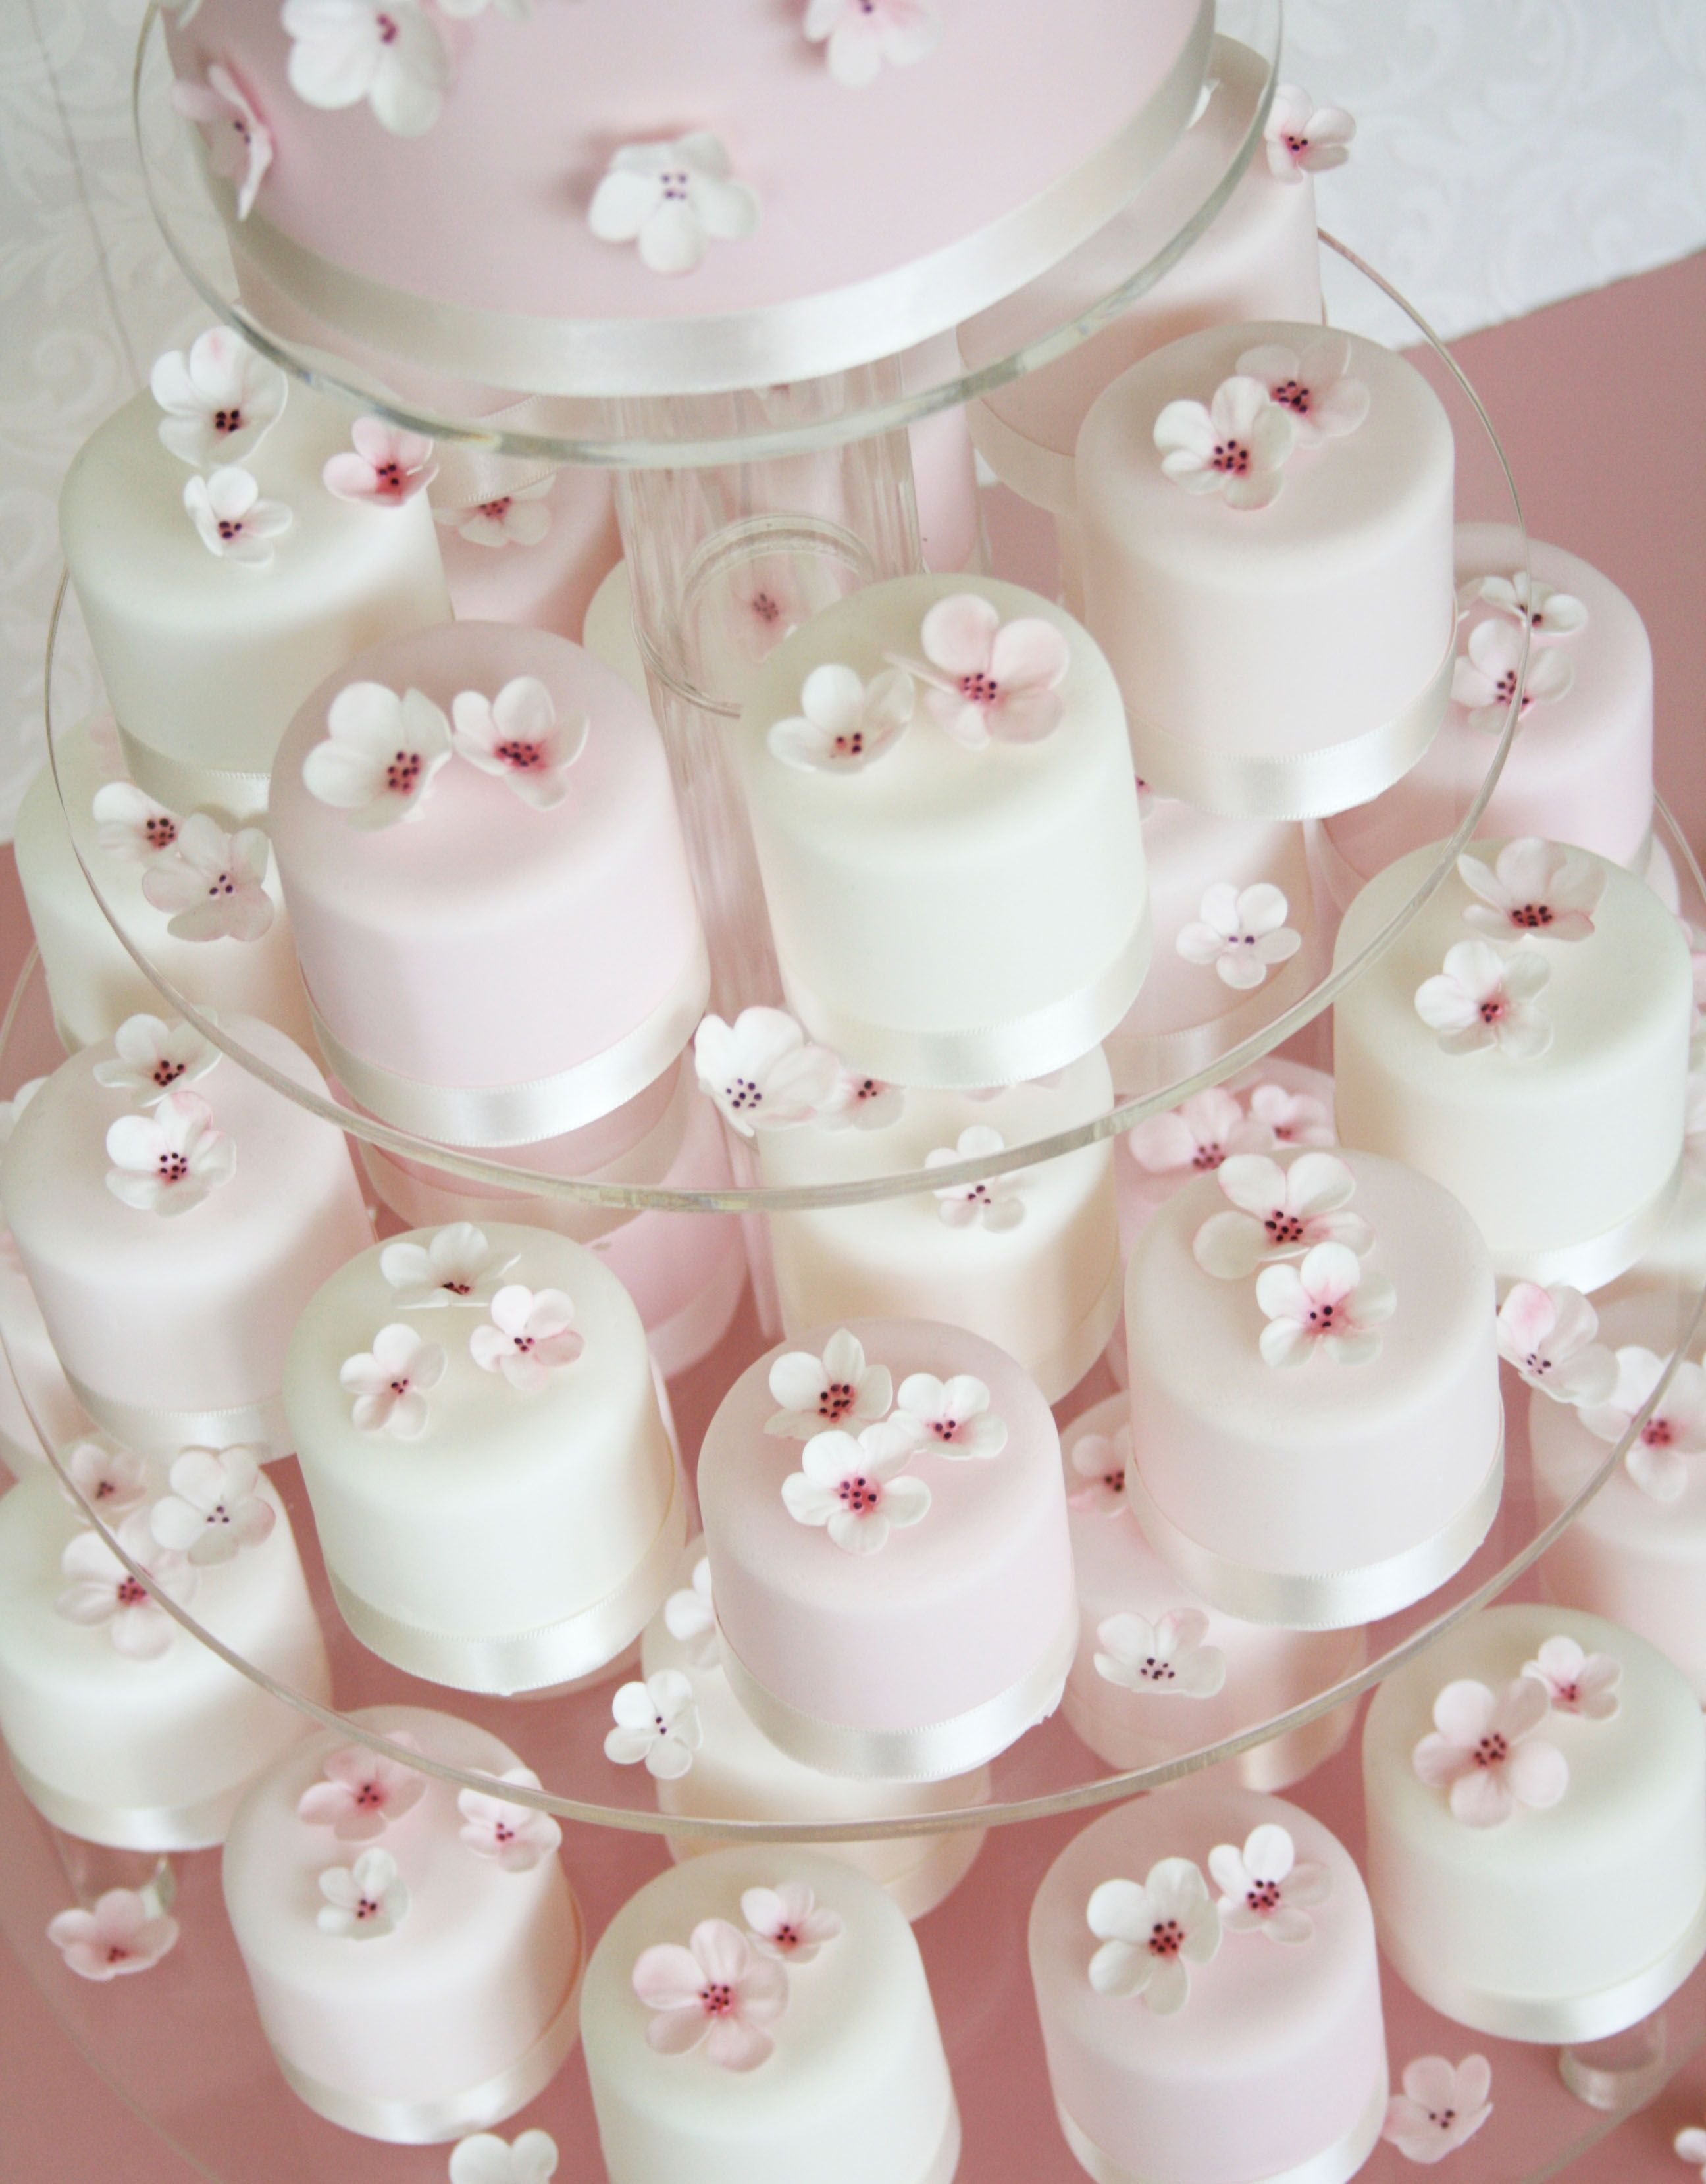 Breathtaking Mini Wedding Cakes As Favors and mini wedding cakes ...